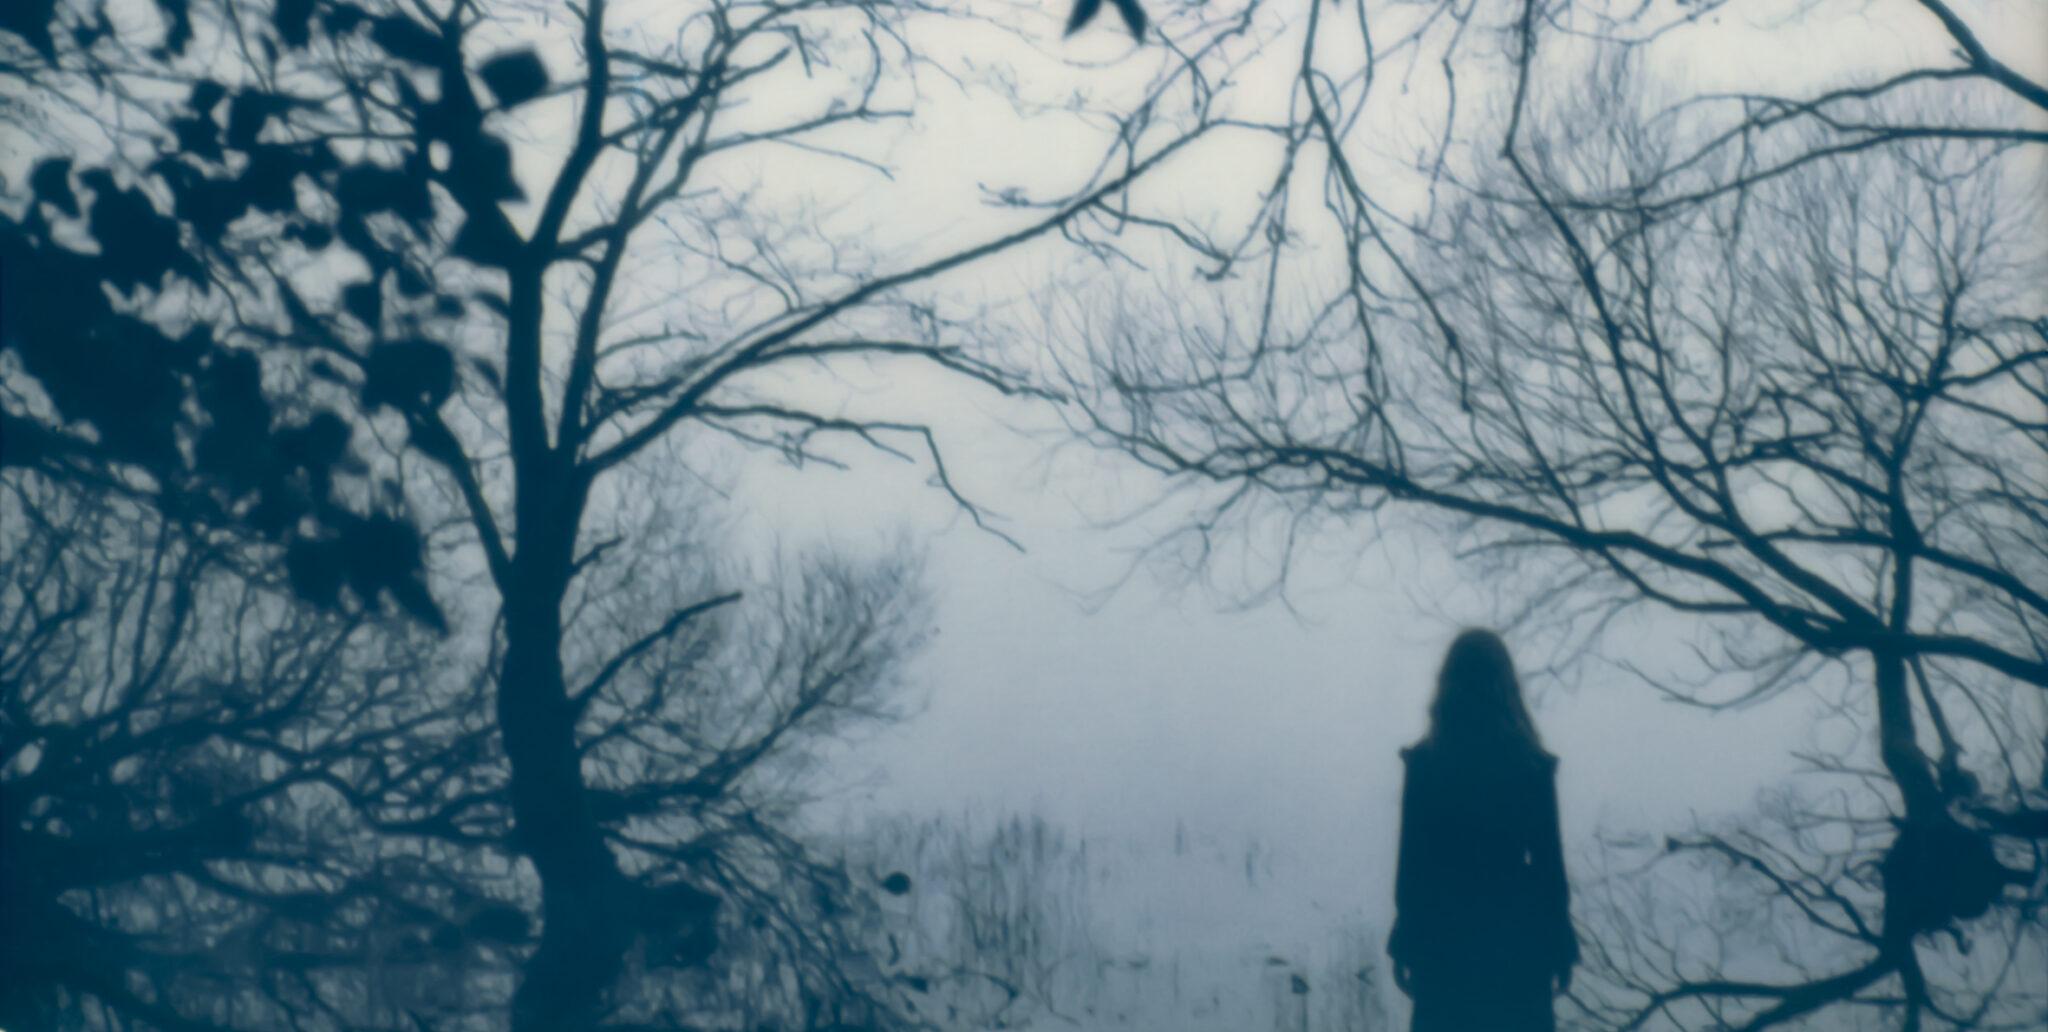 Astrid Kruse Jensen - The Landscape of Memory, 2019